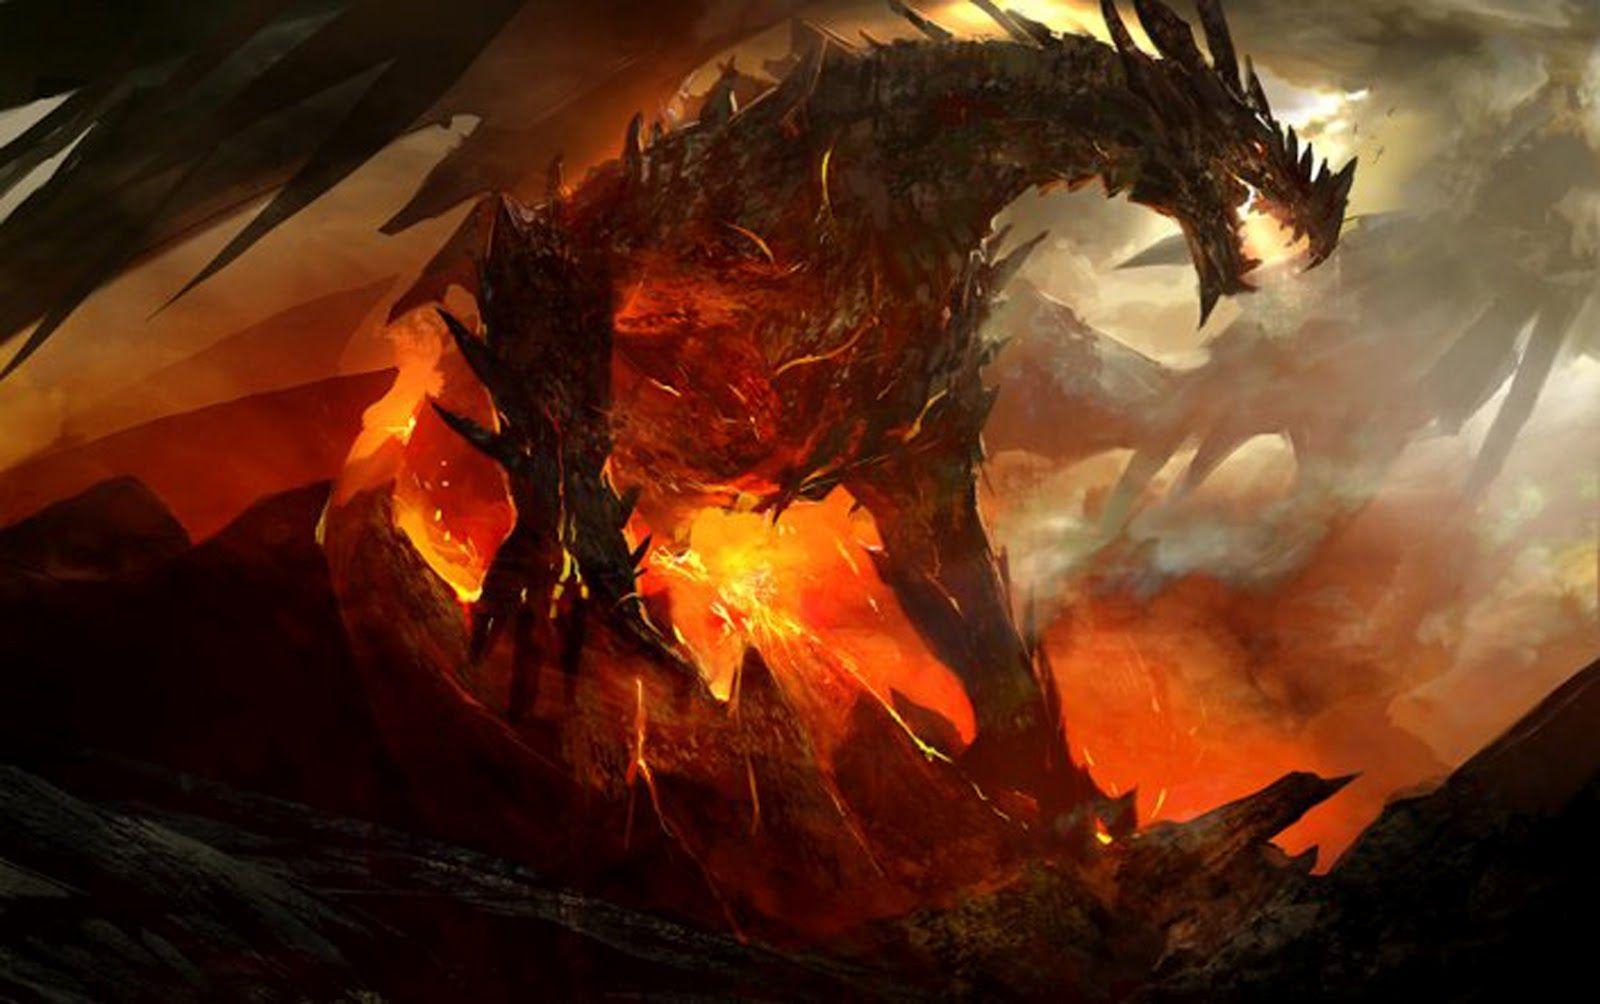 Fire Dragon Red+fire+breathing+fire+dragon+knight+battle How